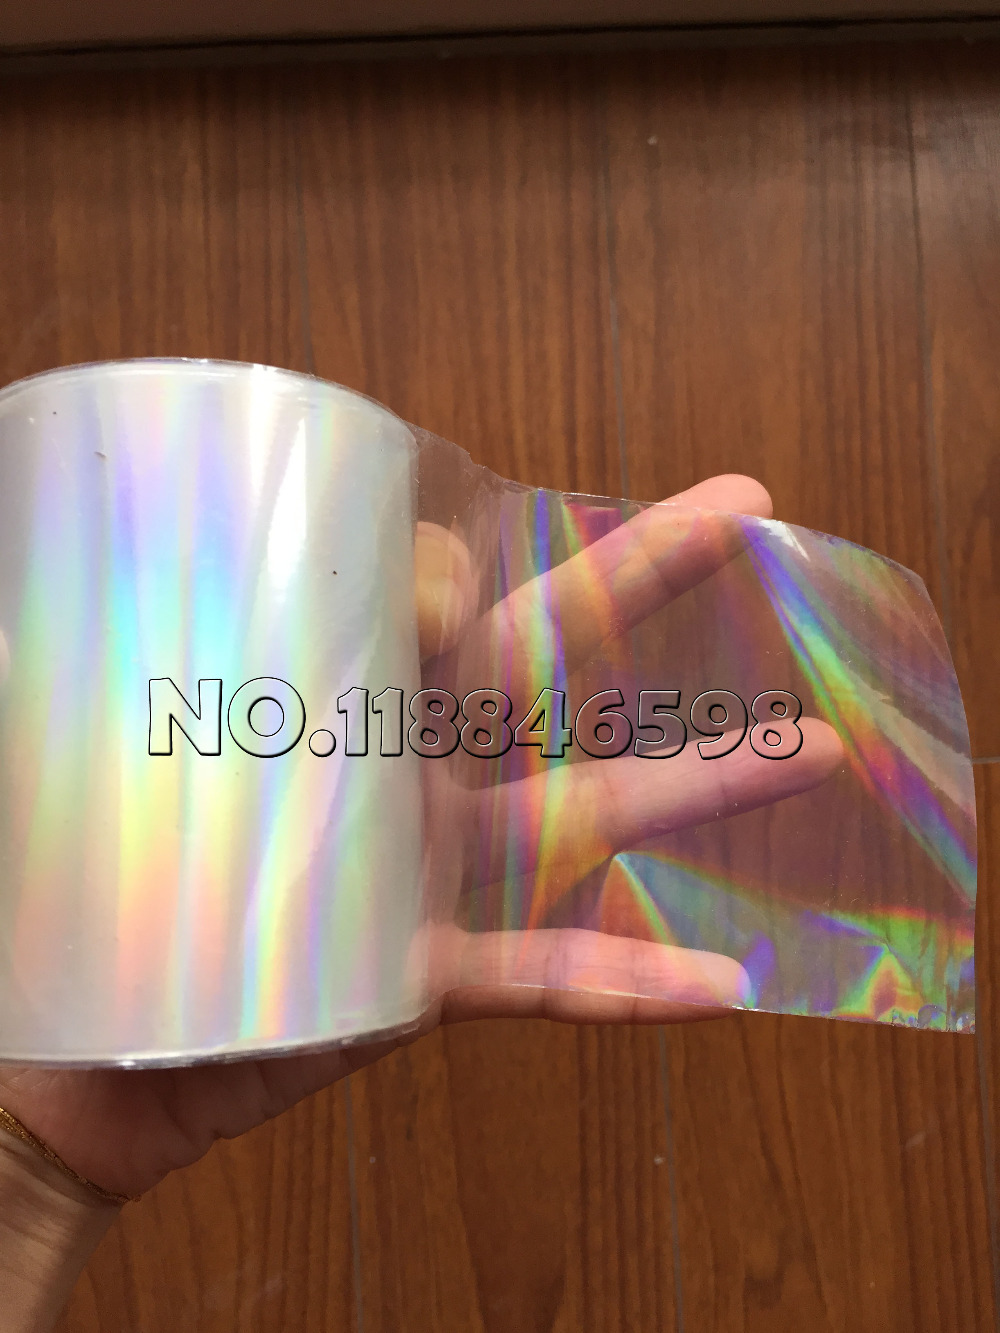 Tool Parts New Style Holographic Foil Plain Transparent Foil Hot Stamping On Paper or Plastic 8cm x 120m//Lot DIY Package Box Color: transaparent